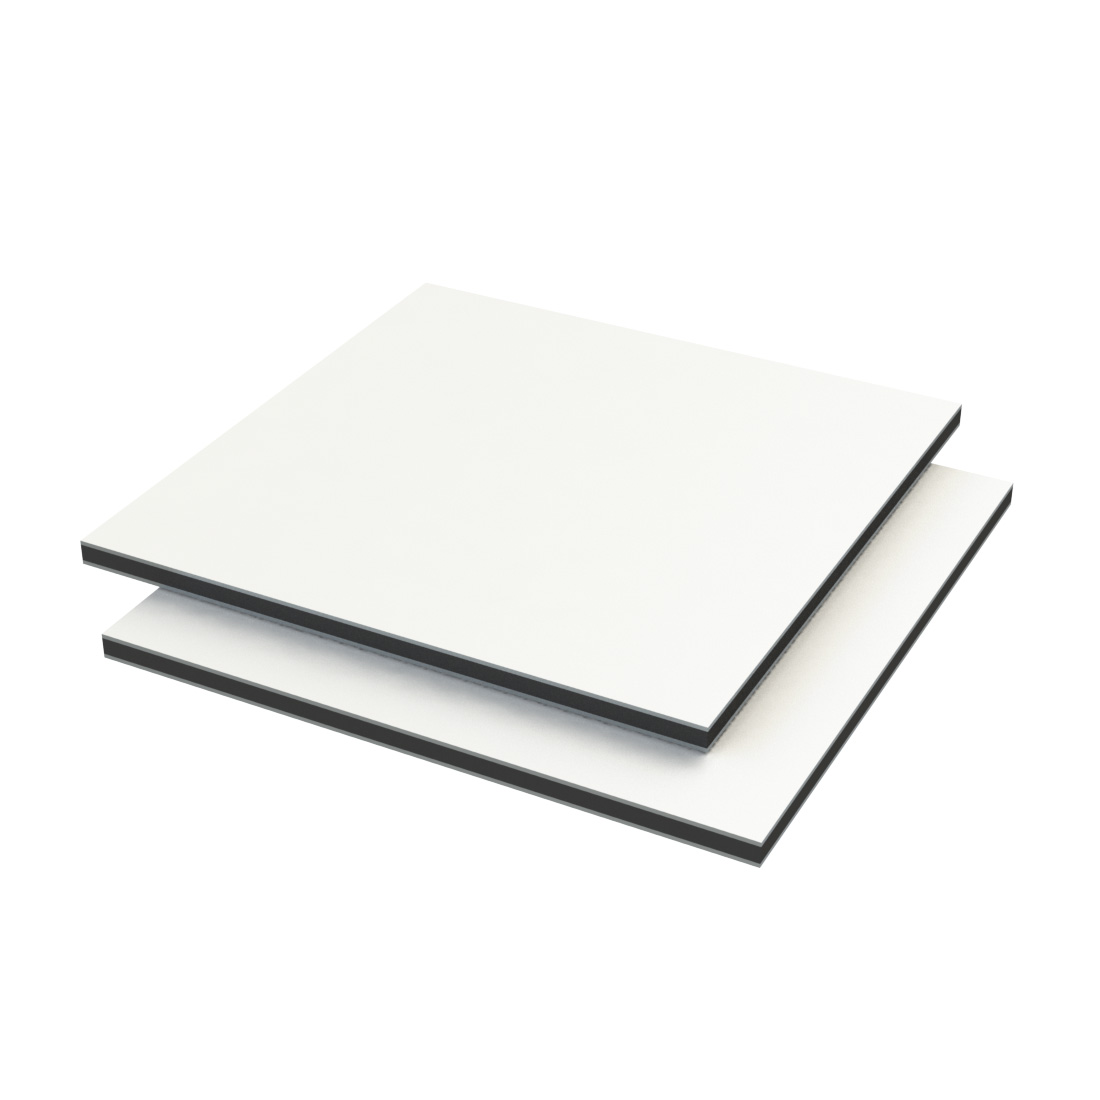 Vibond h Aluminium /PE 40% glans Dig wit 3050x1500x2mm